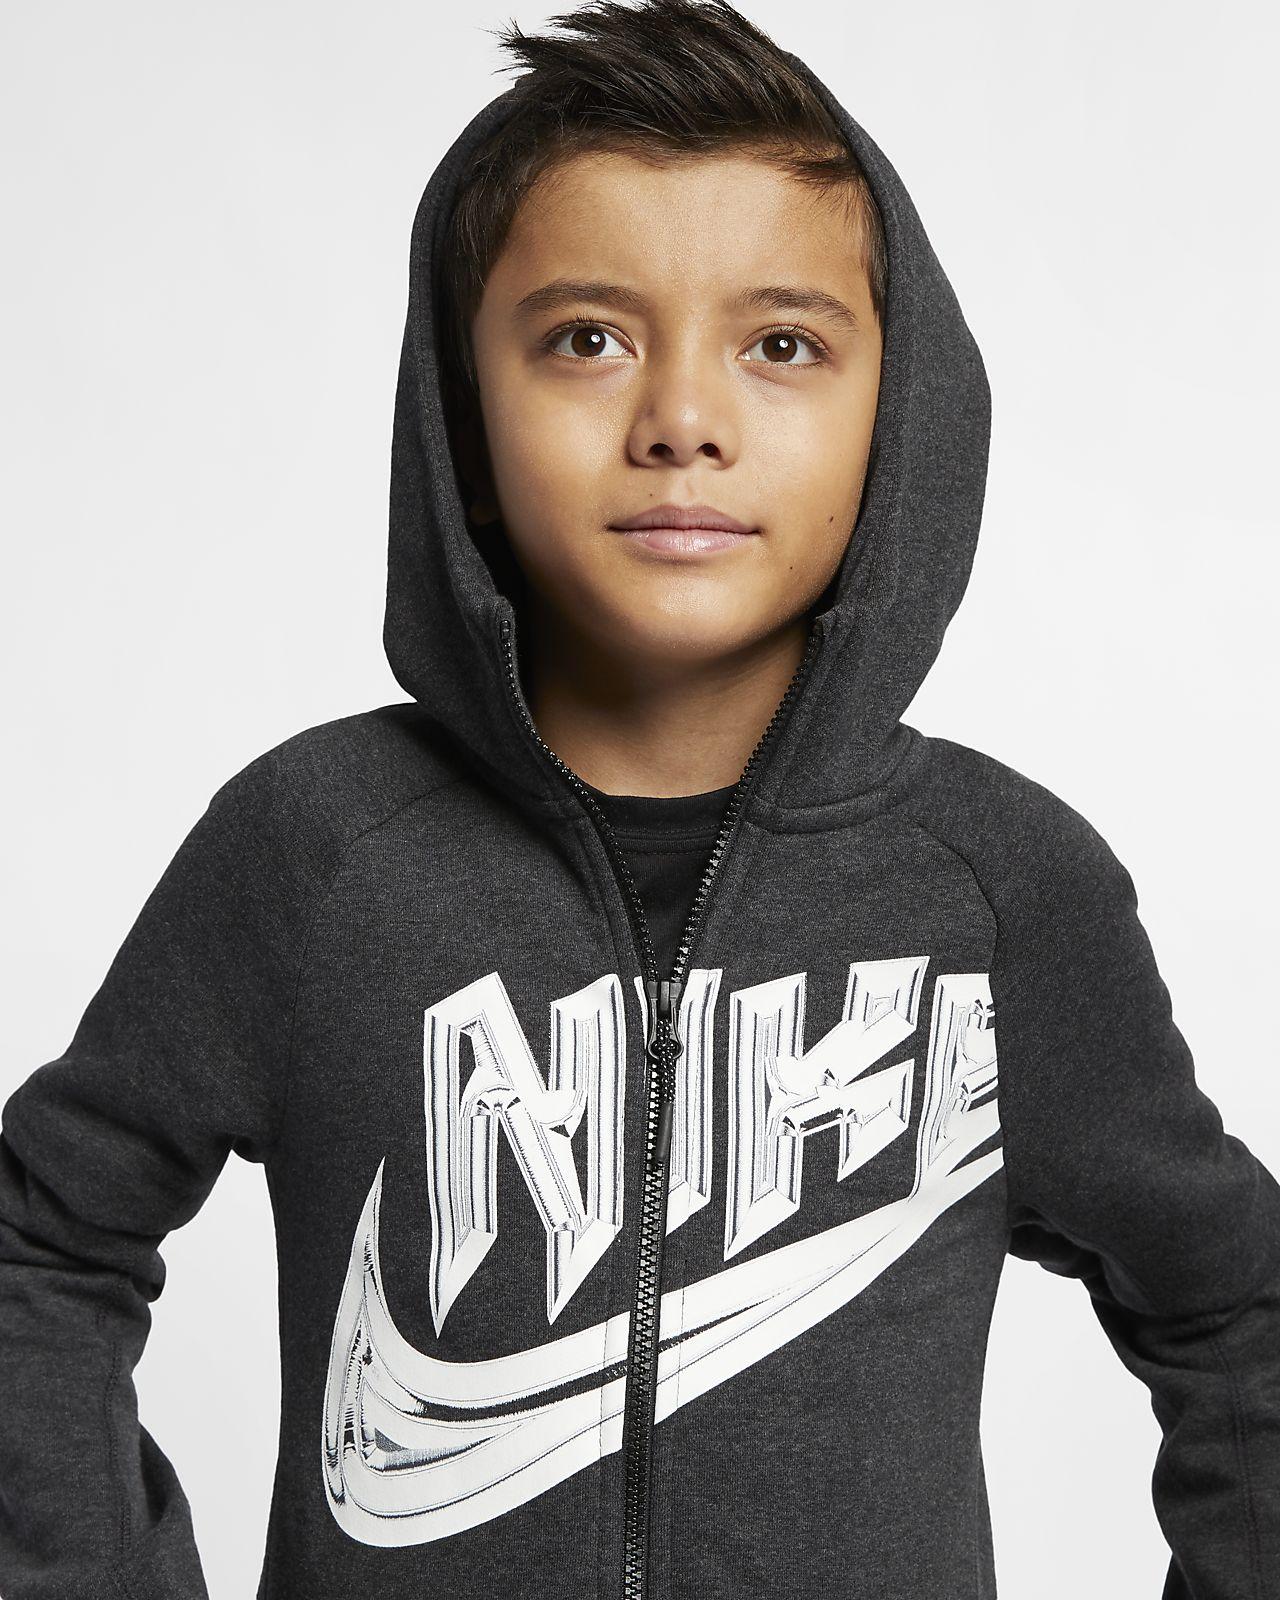 Nike Sportswear 大童(男孩)全长拉链开襟连帽衫